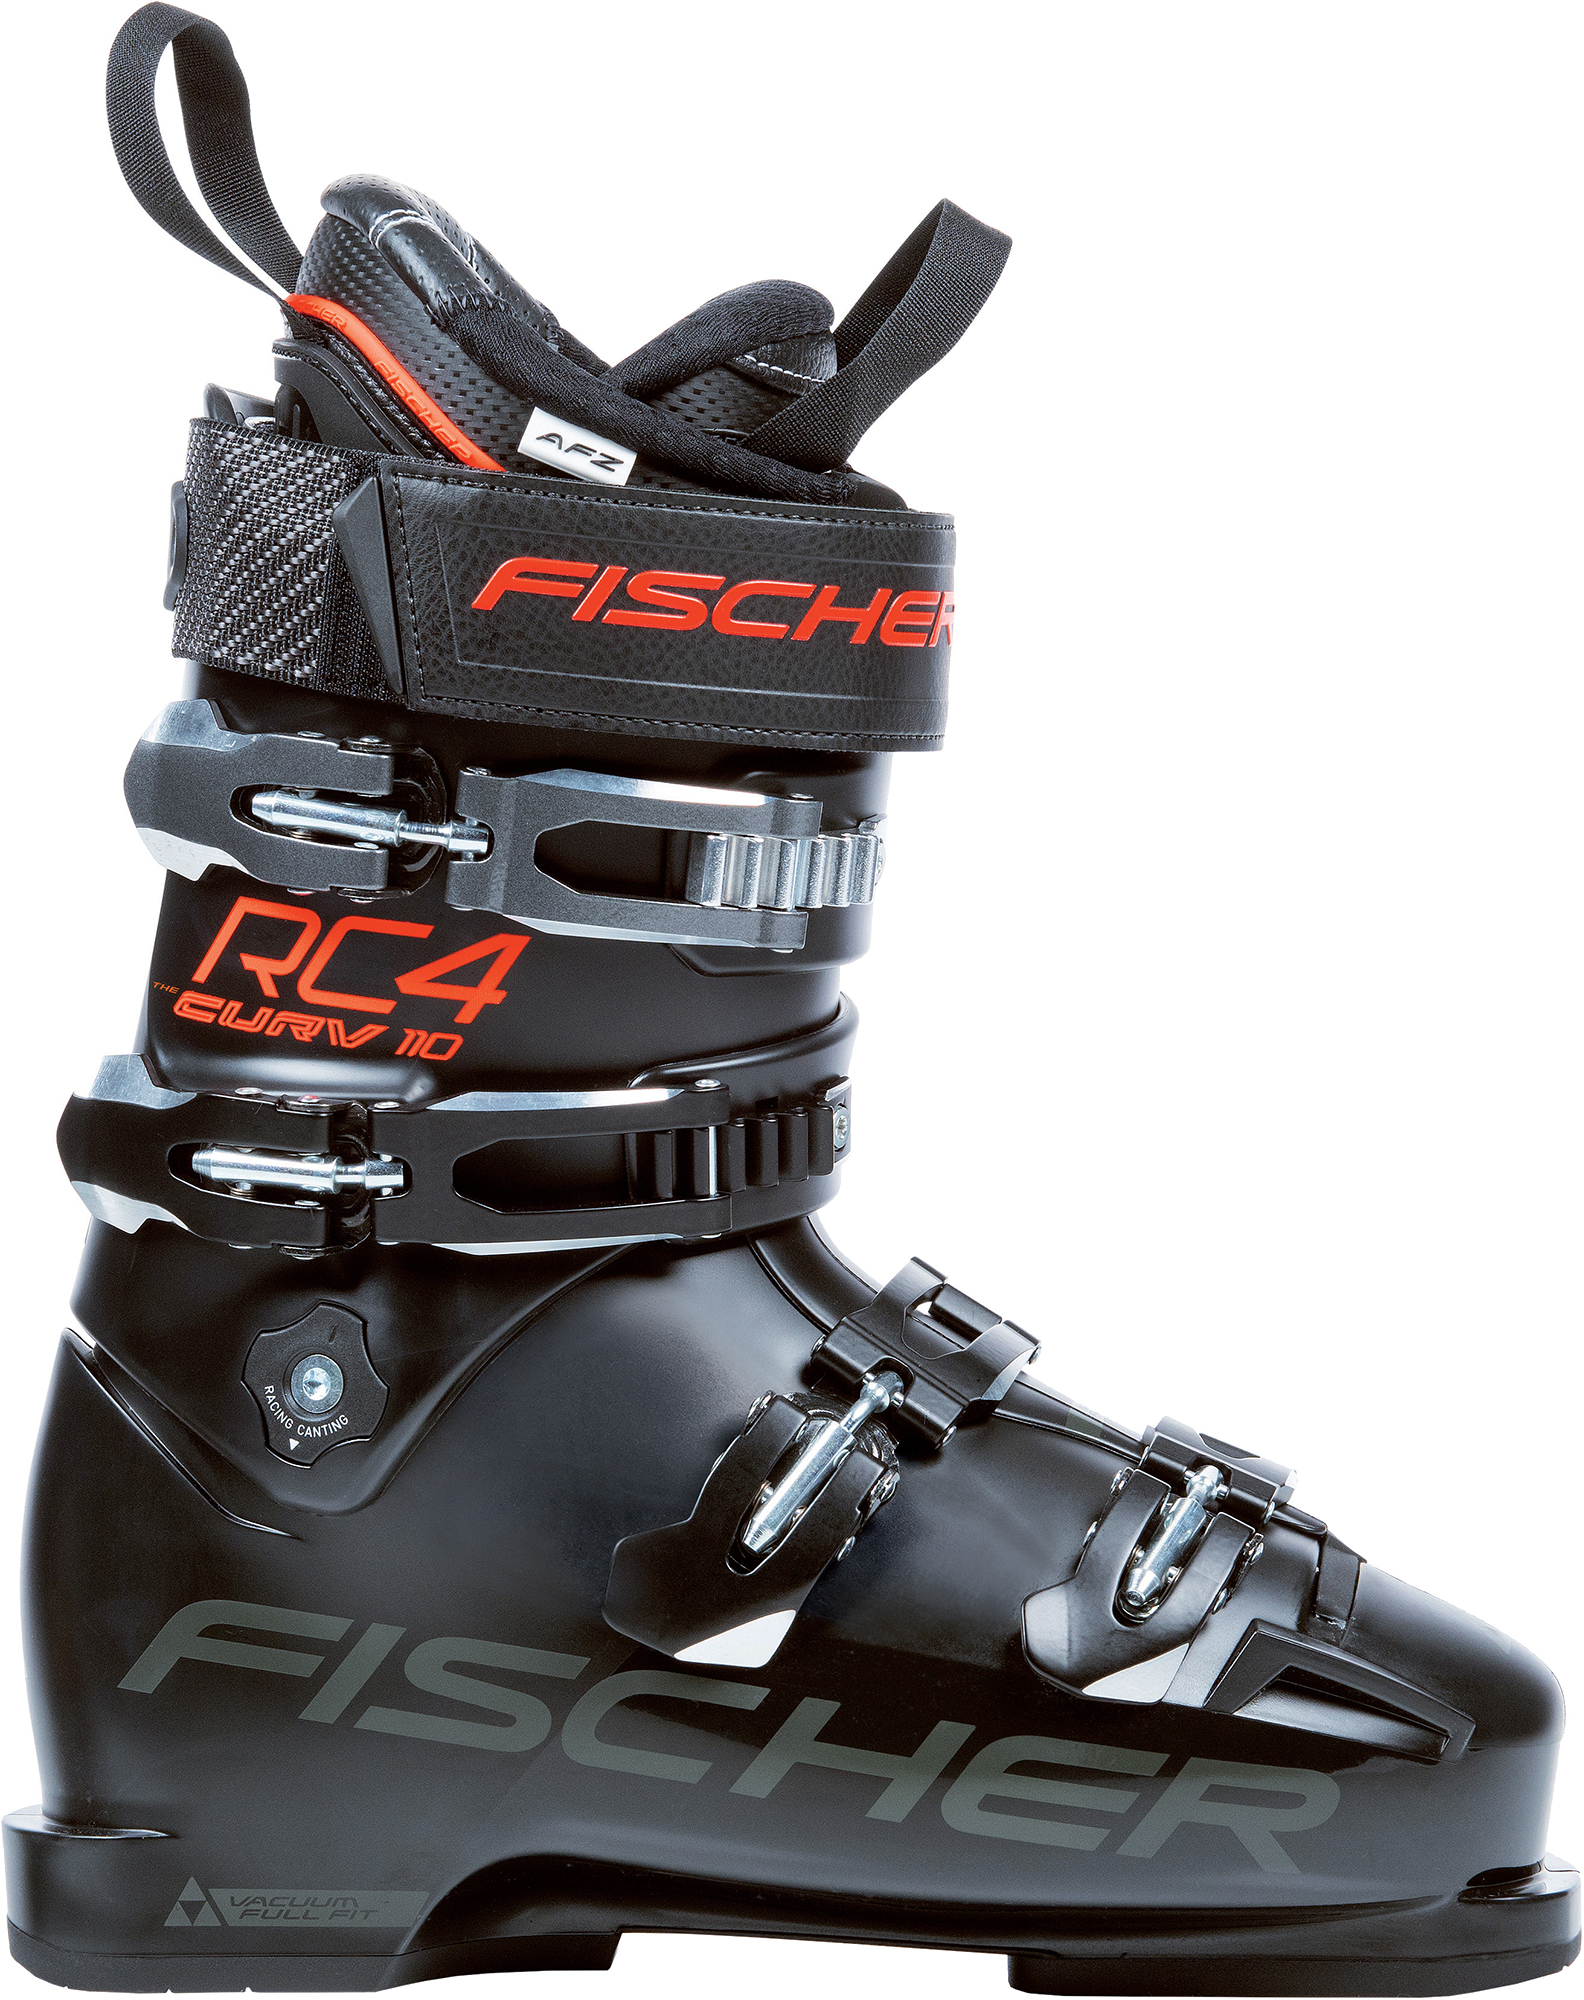 Fischer Ботинки горнолыжные Fischer Rc4 Curv 110 Vacuum Full Fit, размер 45